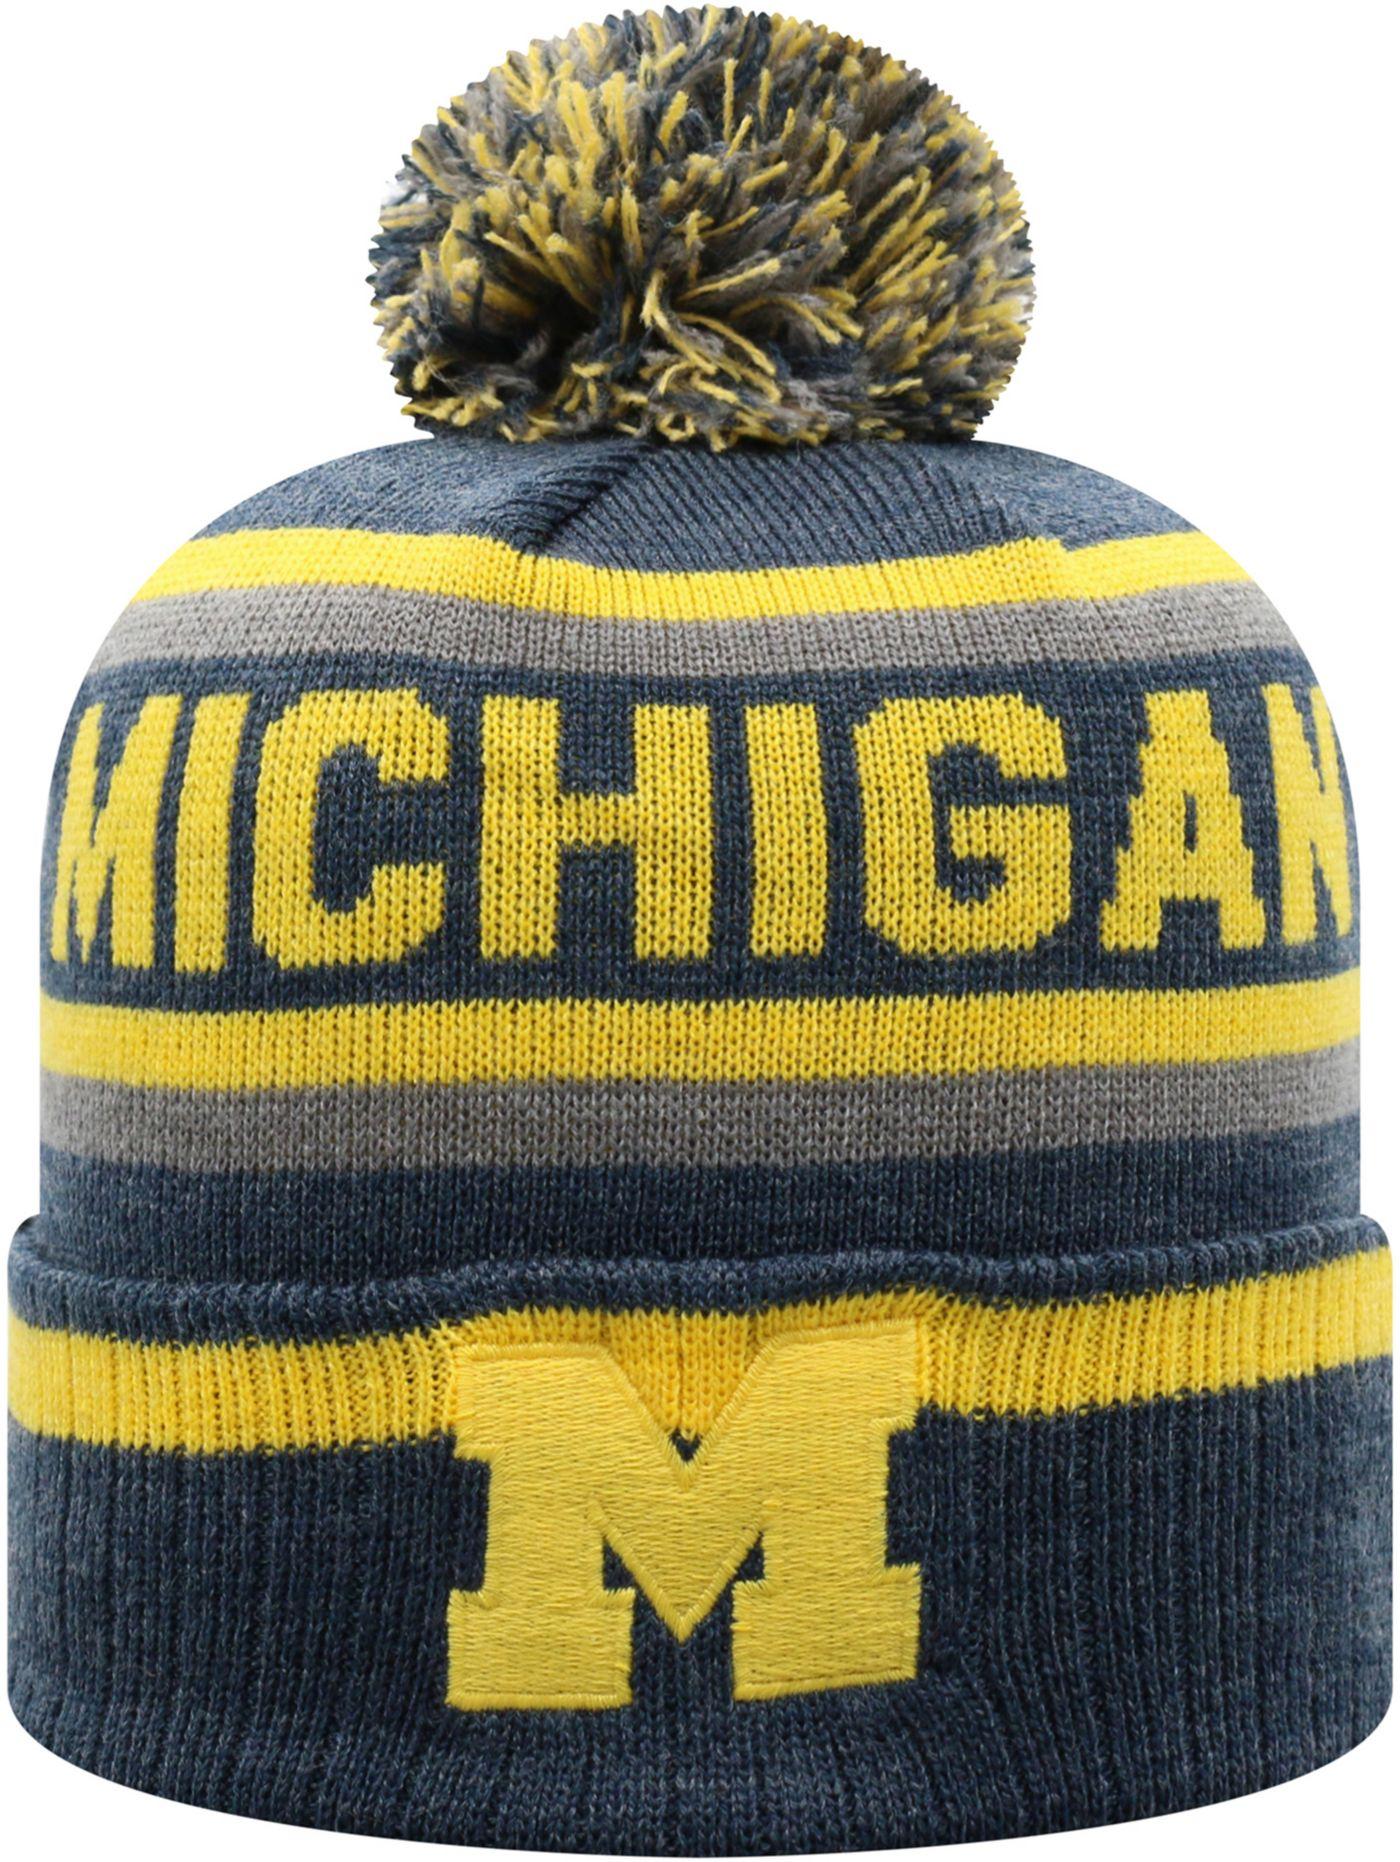 Top of the World Men's Michigan Wolverines Blue Buddy Cuffed Pom Knit Beanie